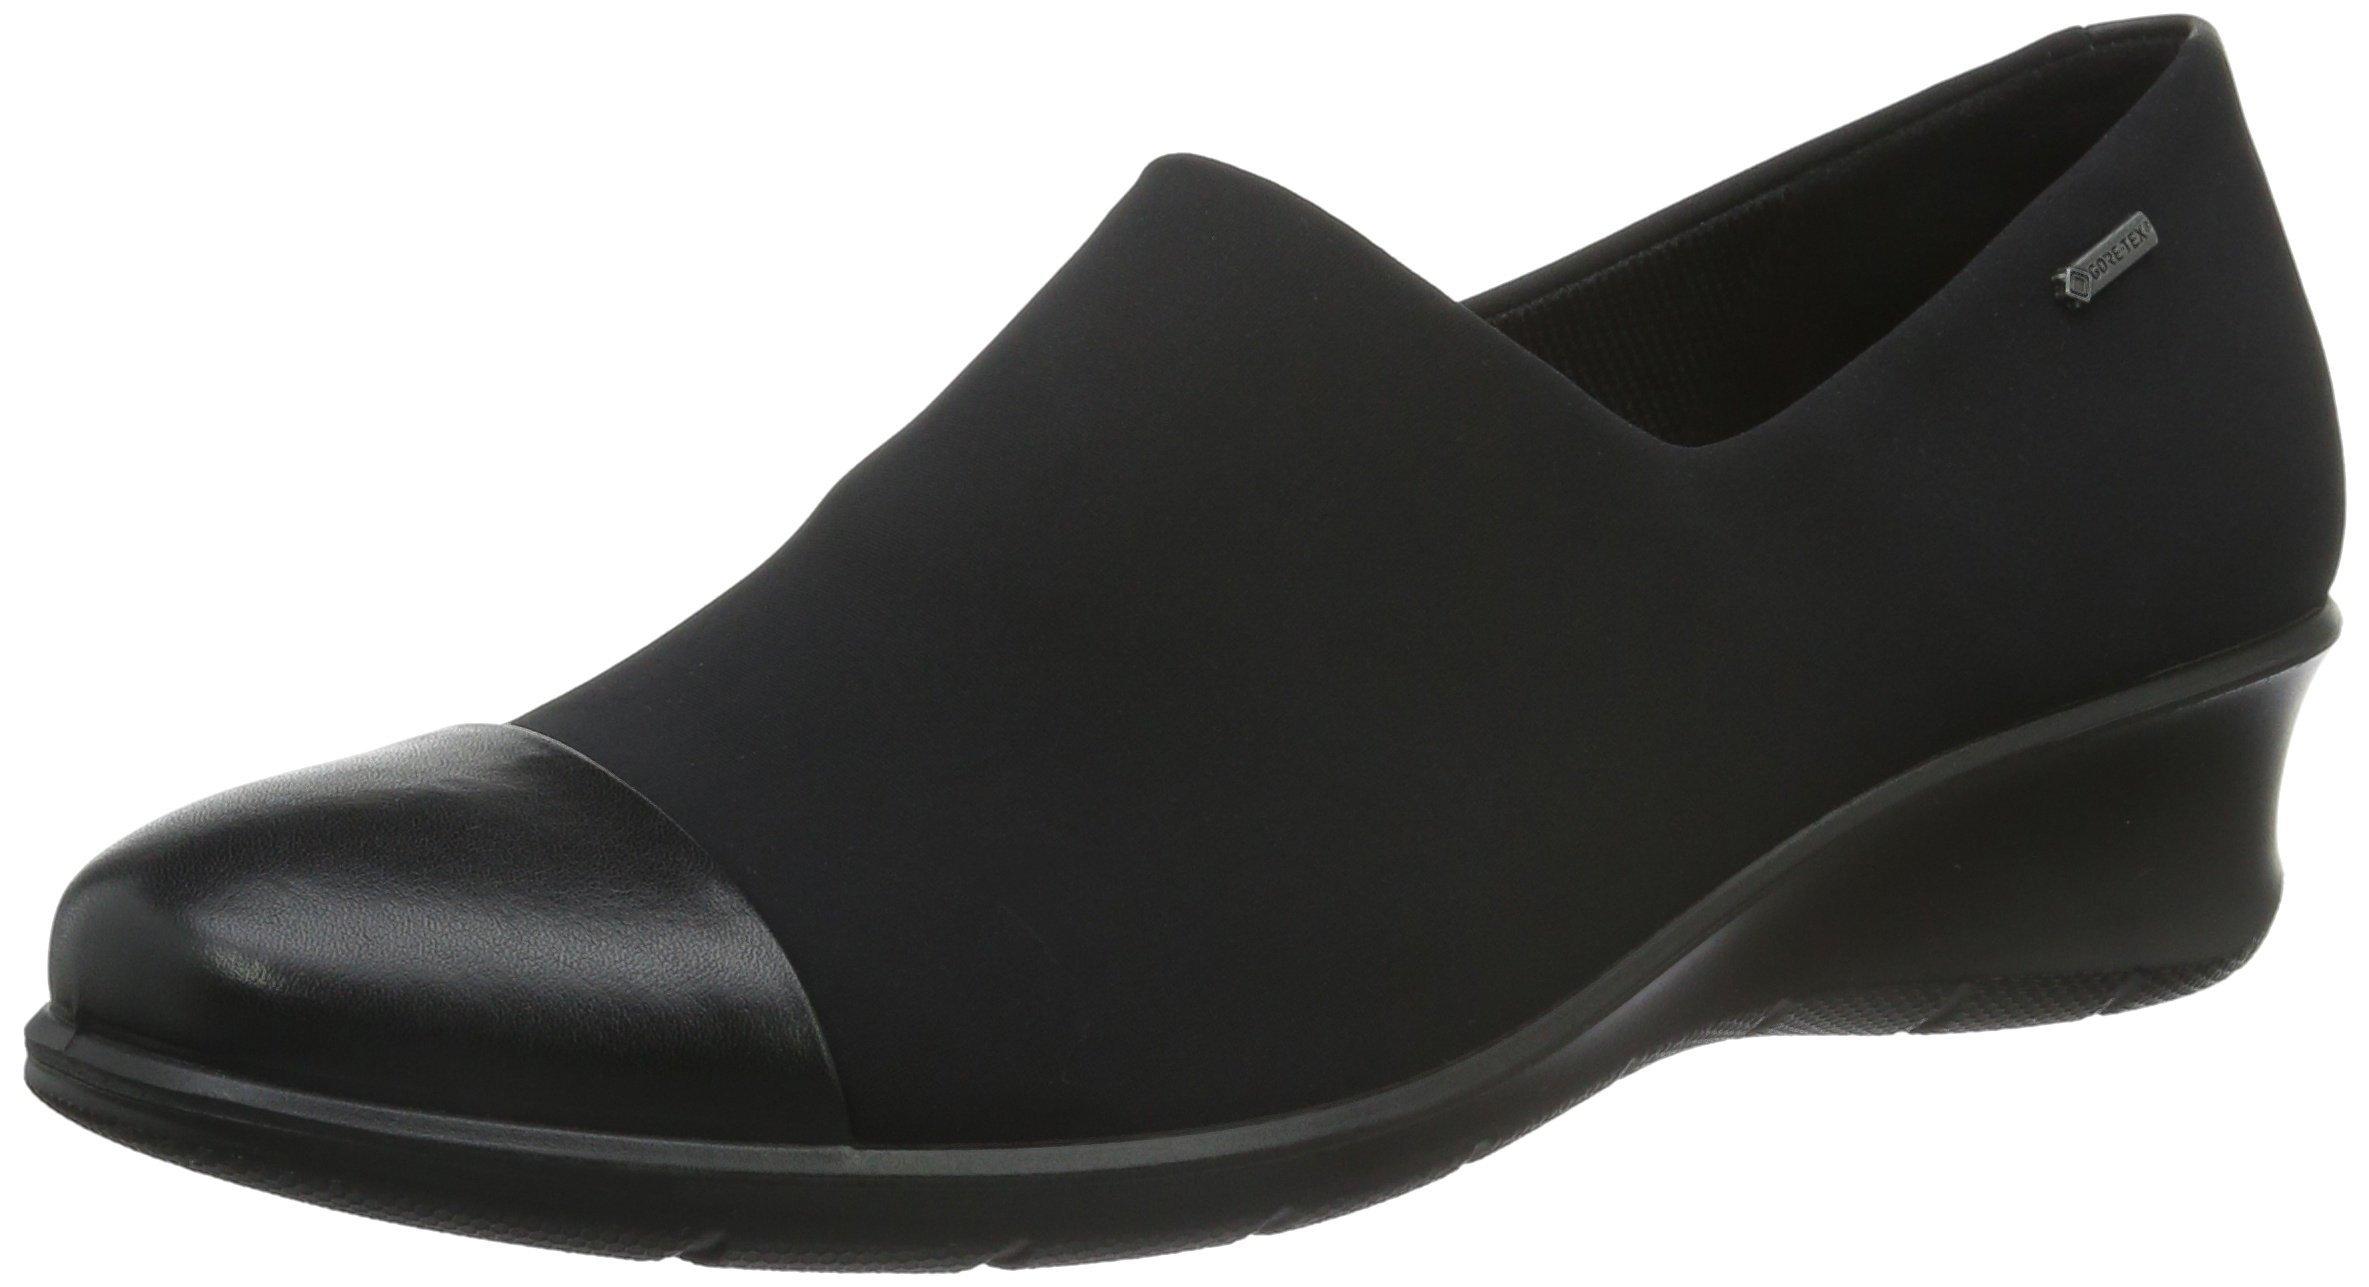 ECCO Footwear Womens Felicia GTX Slip-On Loafer, Black/Black, 39 EU/8-8.5 M US